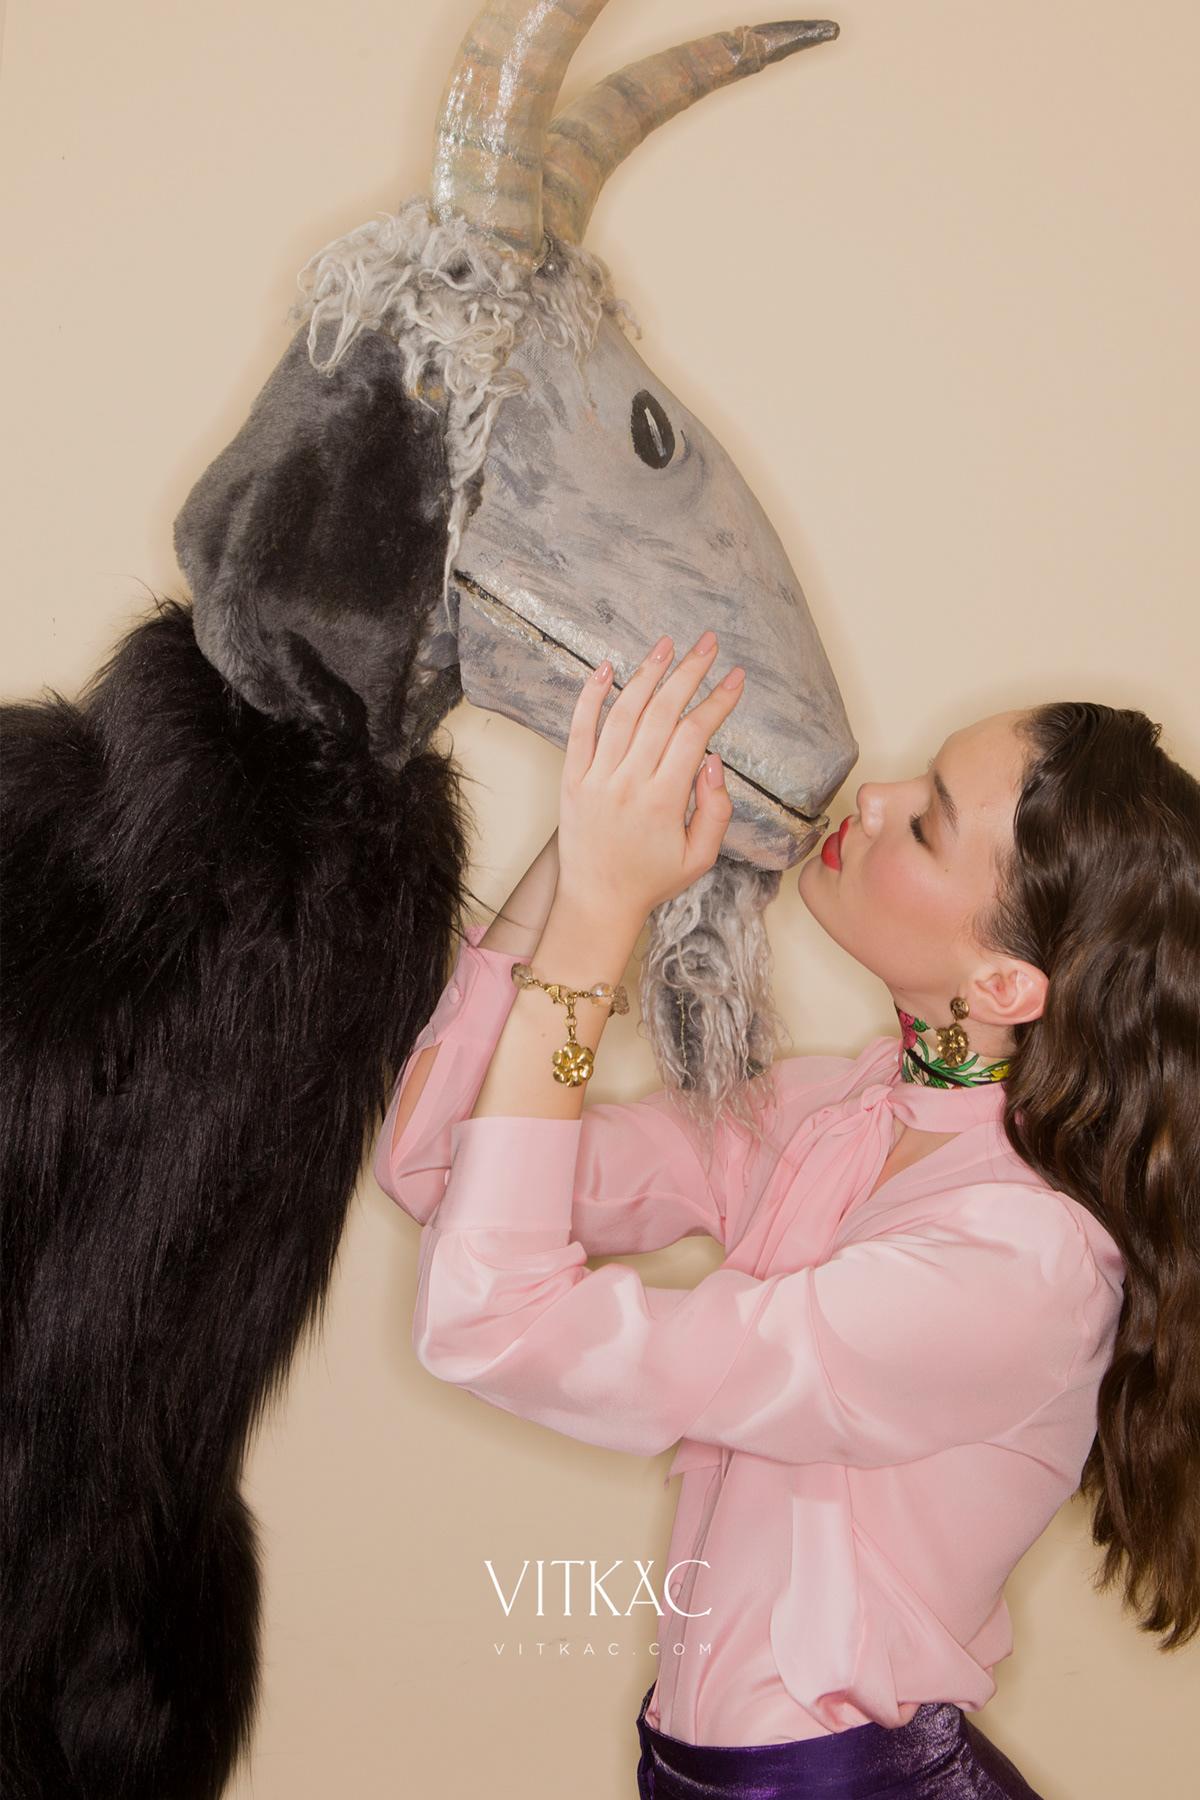 Image may contain: person, kiss and wall